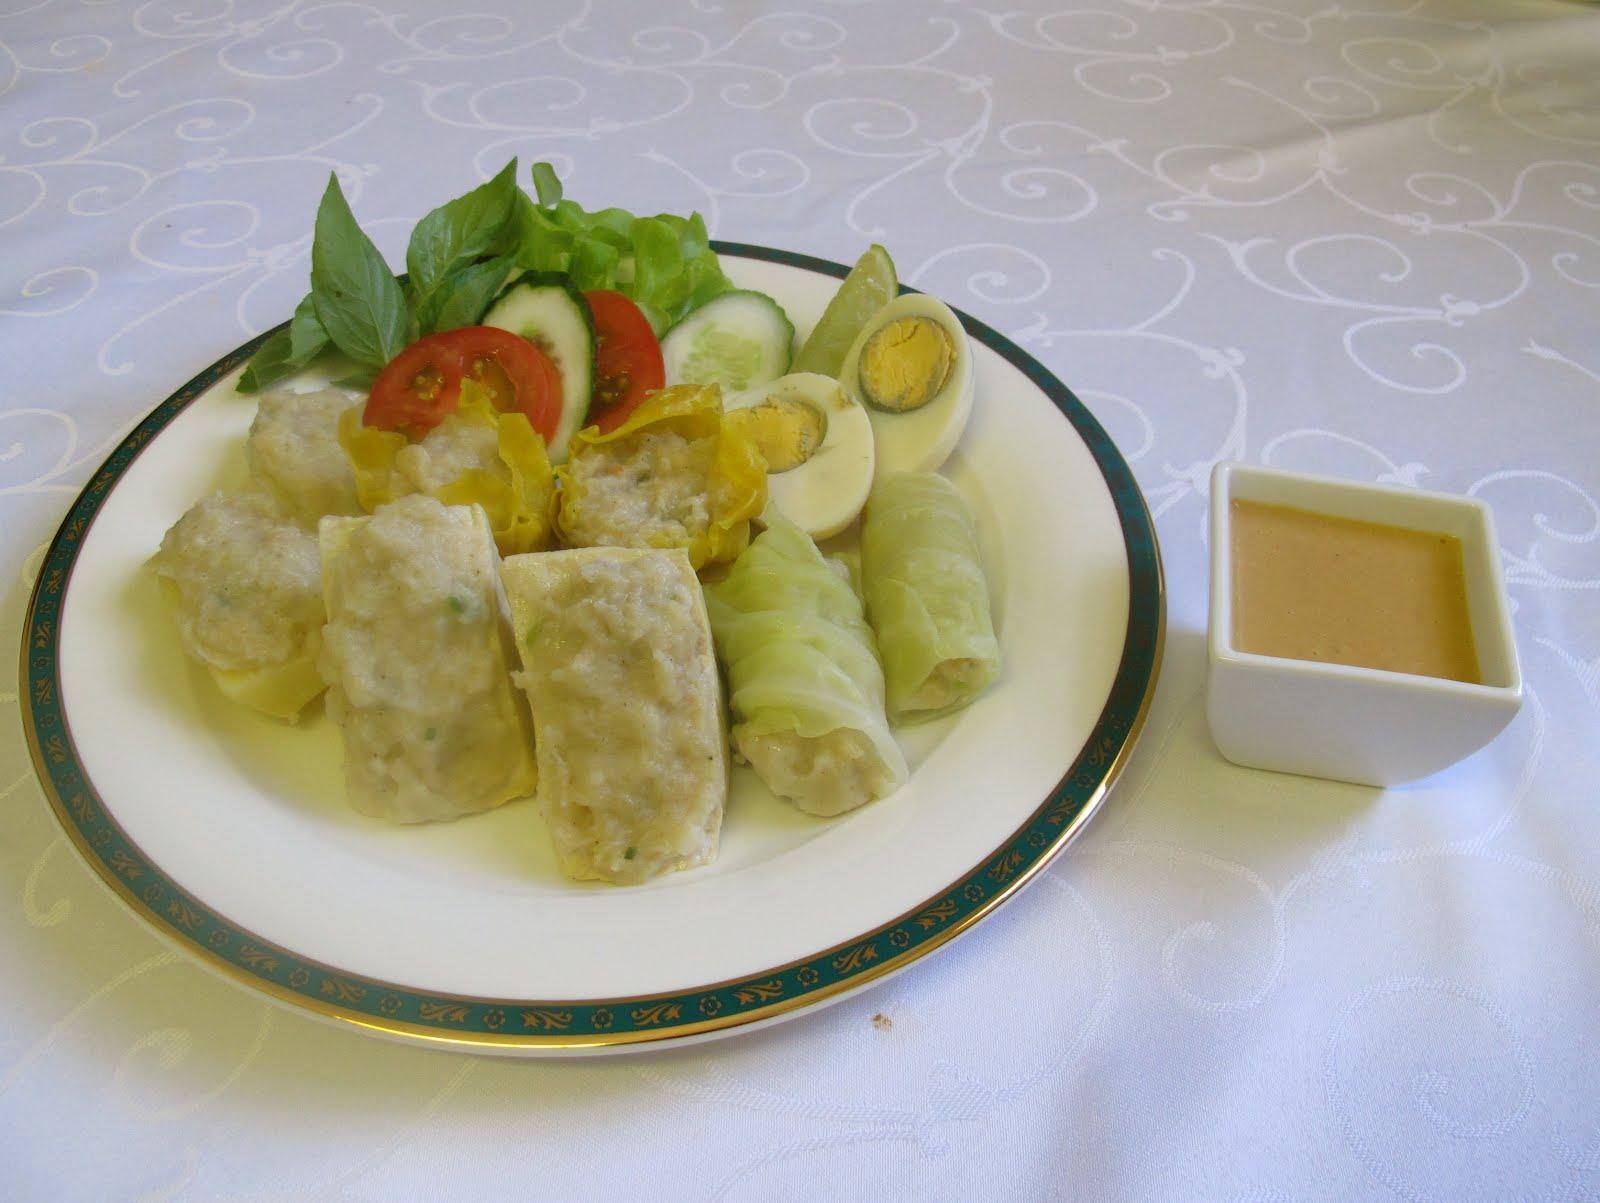 10 Makanan Enak Untuk Makan Siang